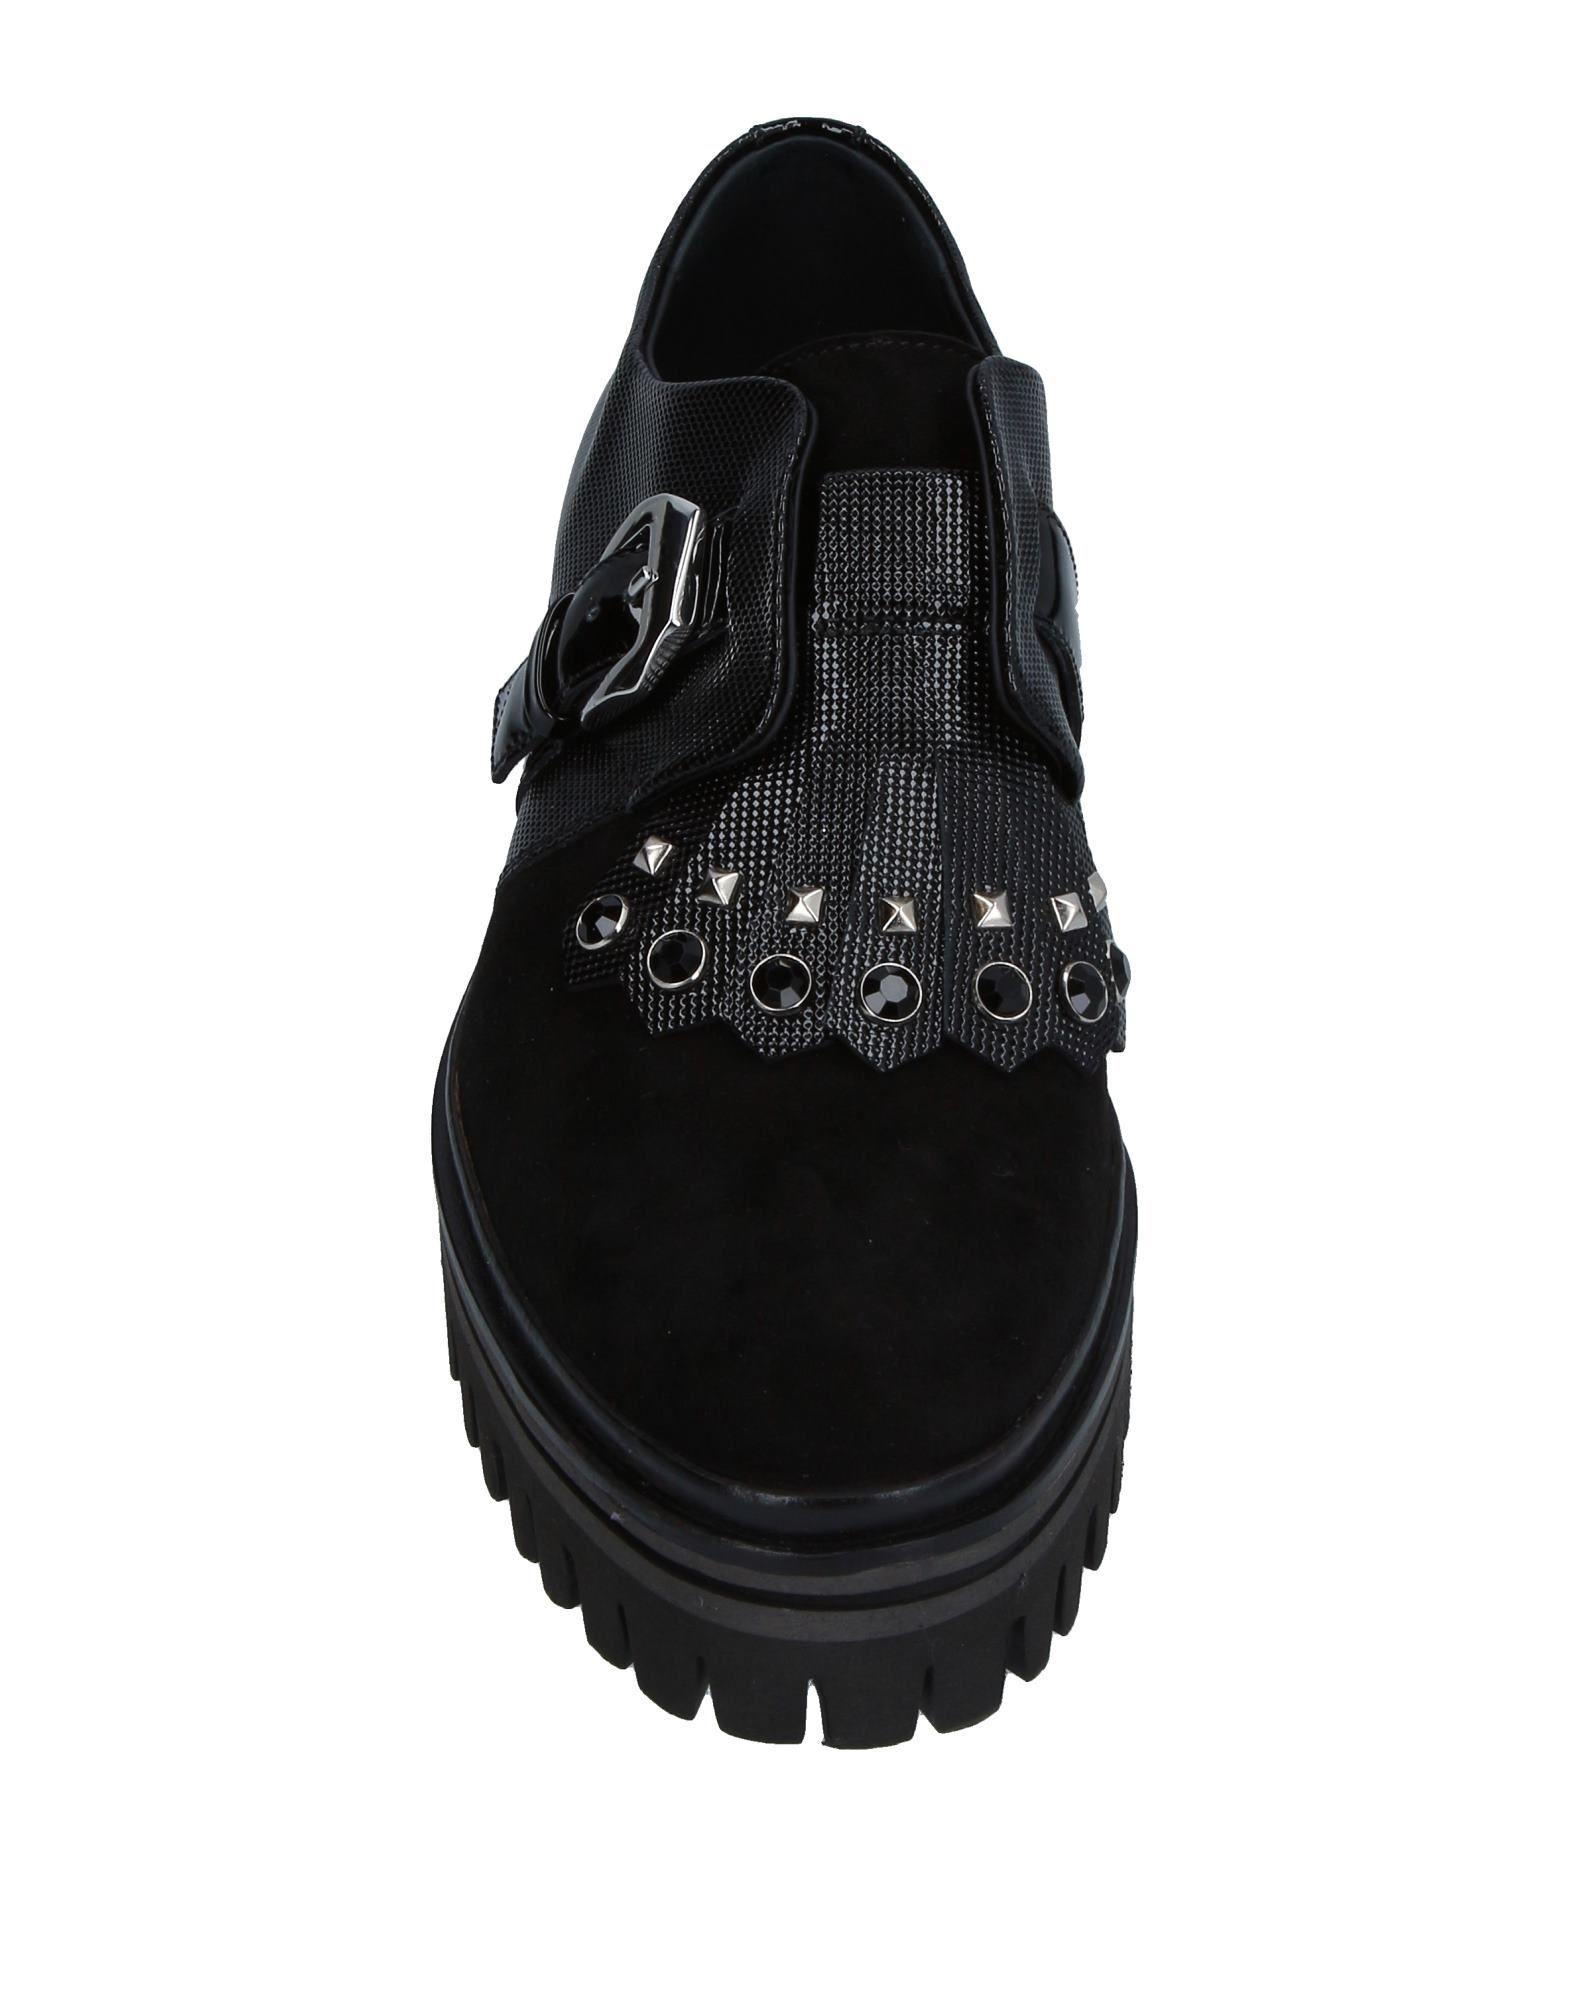 Gut um billige Damen Schuhe zu tragenAlberto Guardiani Mokassins Damen billige  11253789FQ 11849a